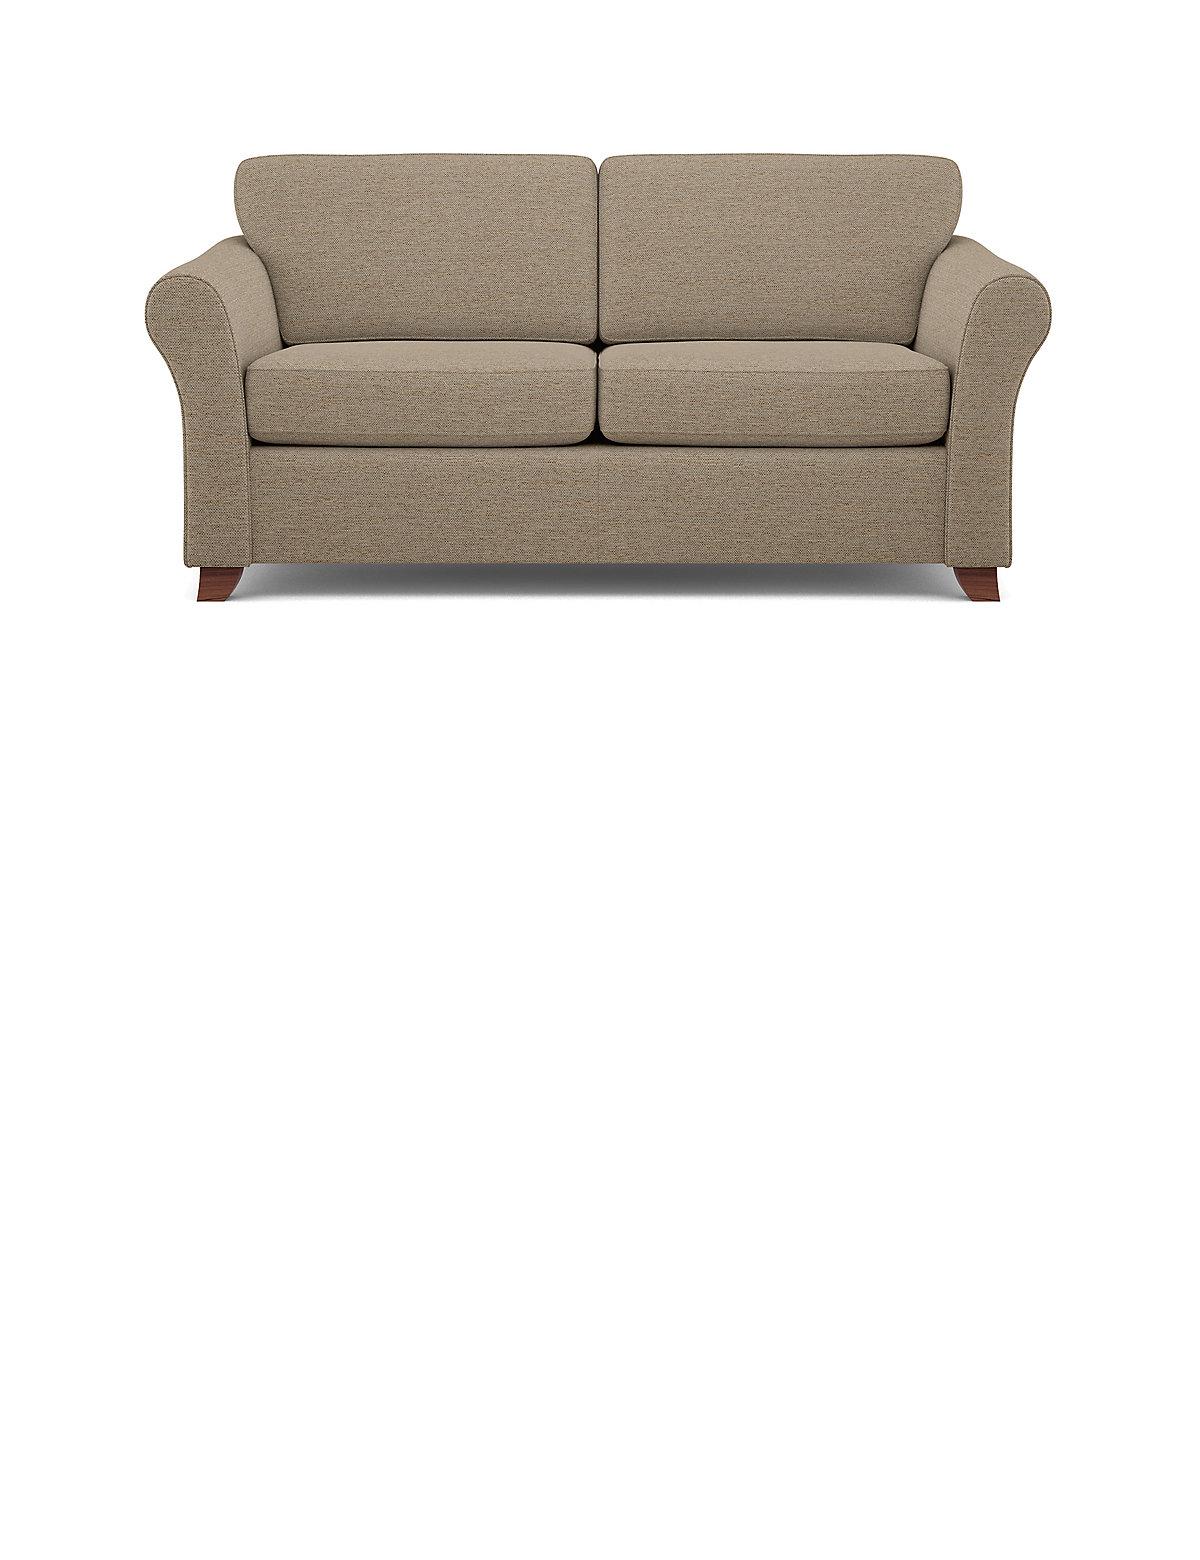 Image of Abbey Medium Sofa